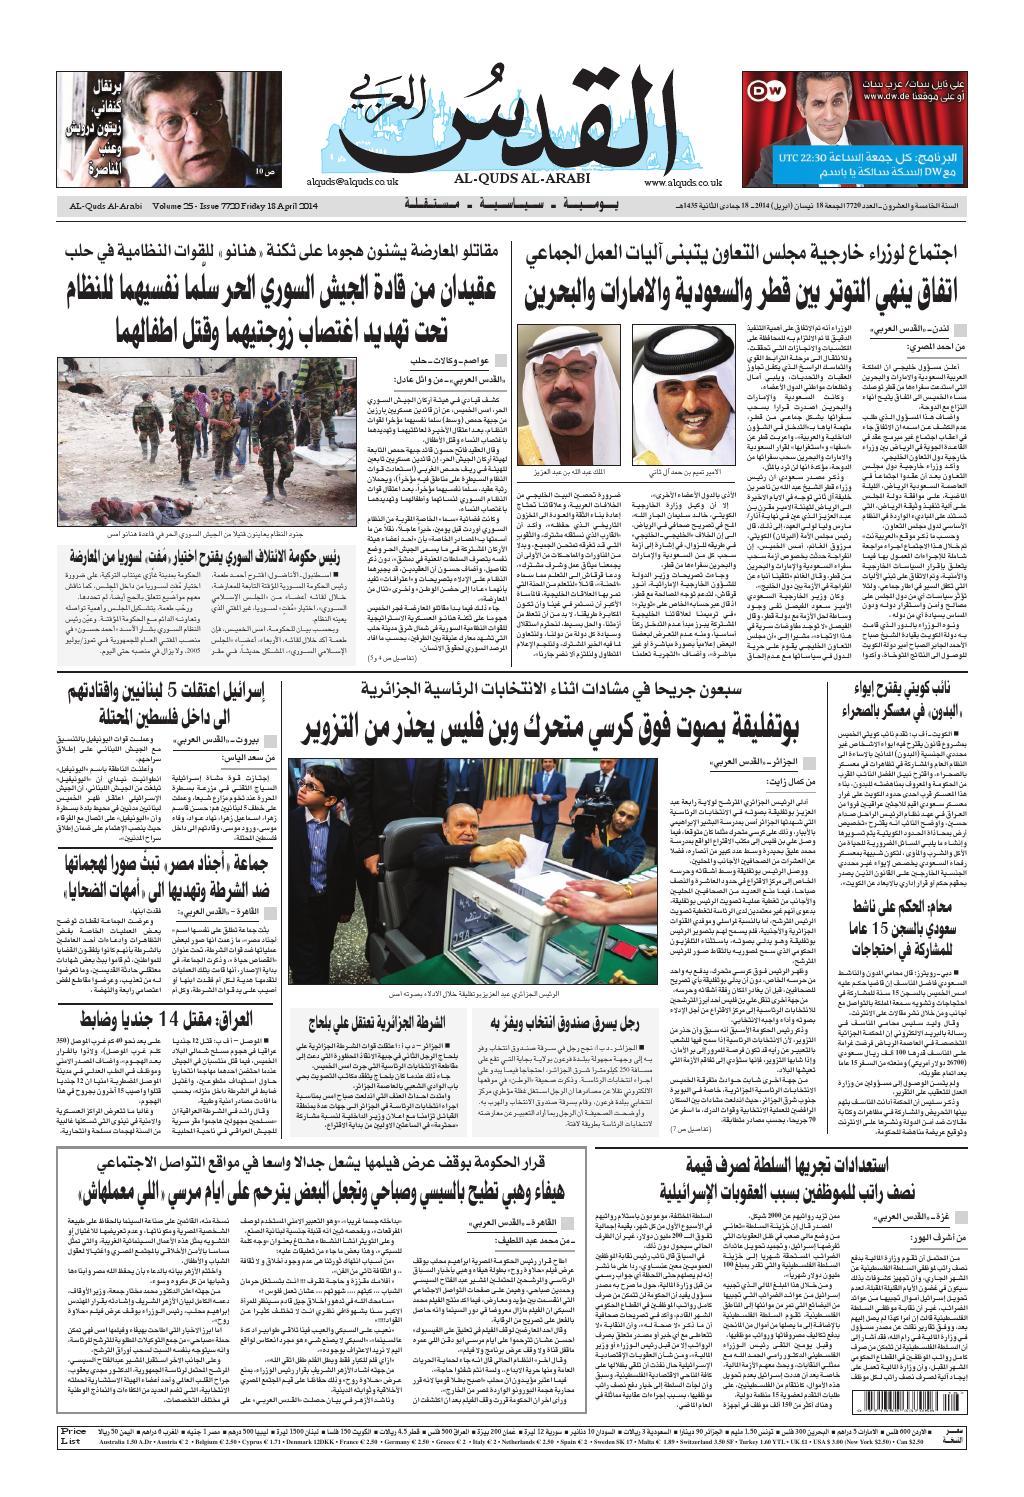 941fd405d صحيفة القدس العربي , الجمعة 18.04.2014 by مركز الحدث - issuu